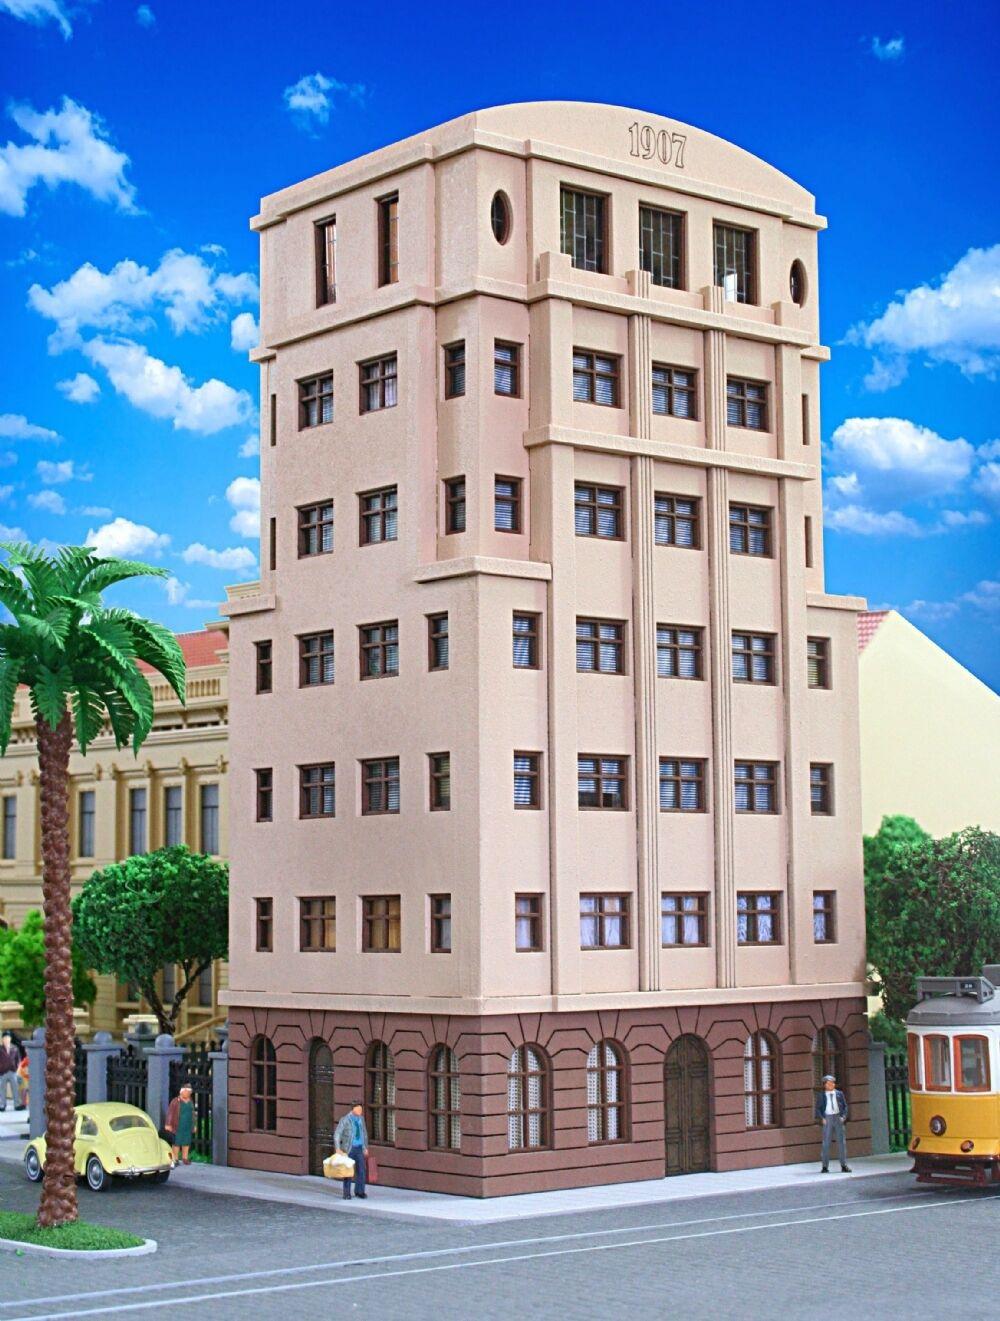 HO - 1 87 - HOLZMANN MODELS - Chamber of Commerce